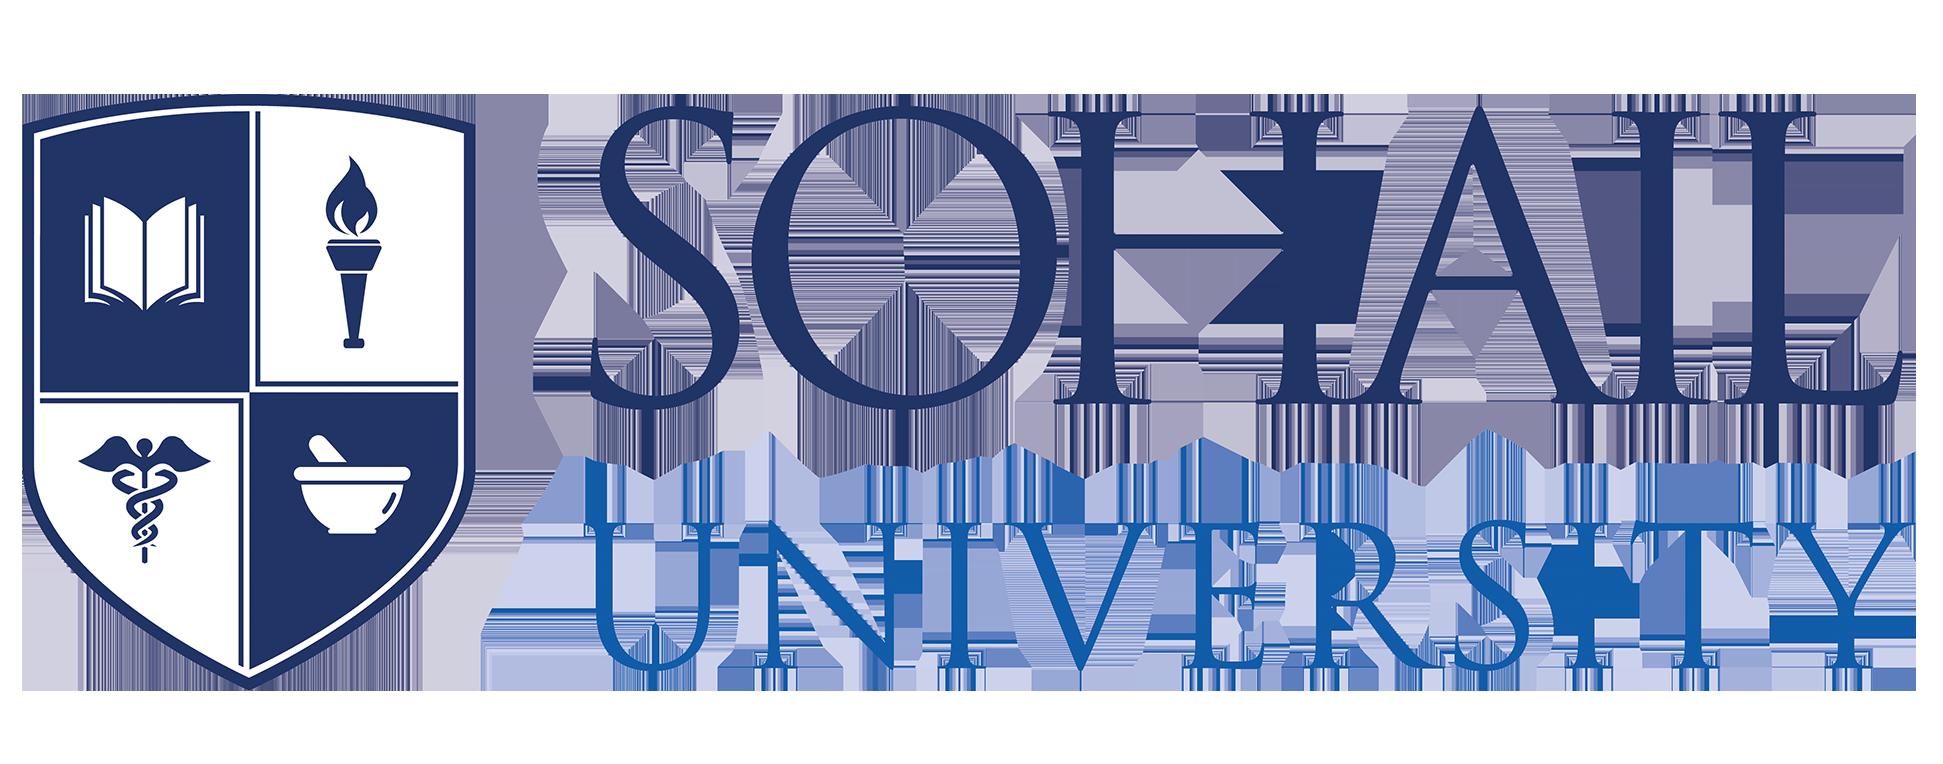 Sohail University Karachi BBA Admissions 2021